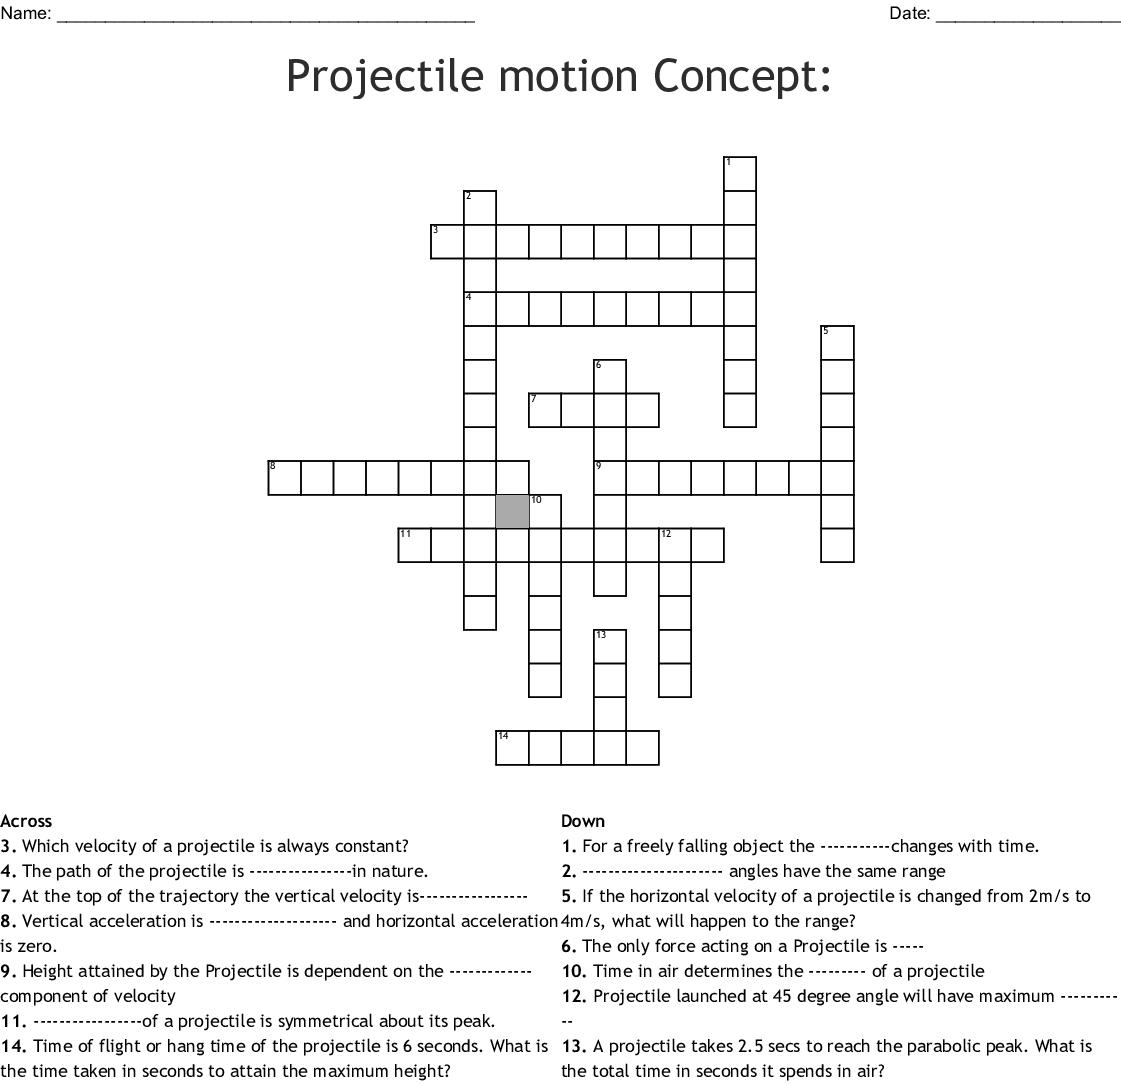 Projectile Motion Crossword